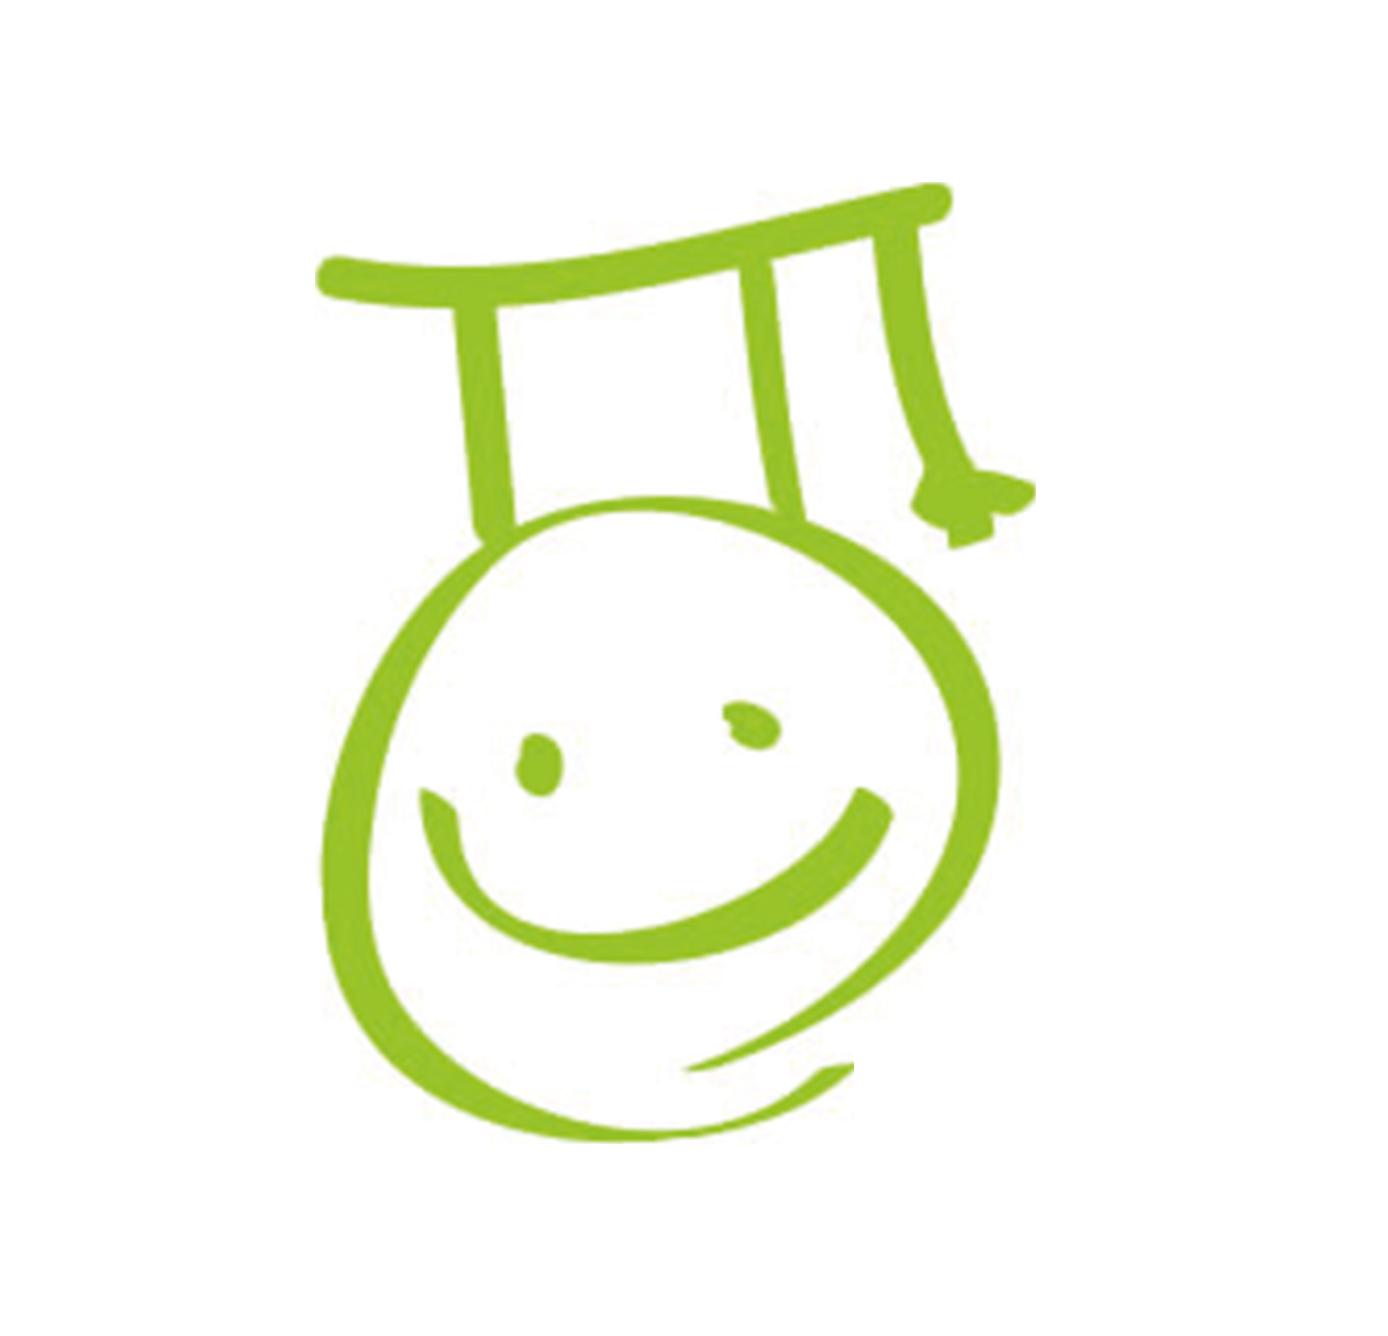 njoy Abschluss Smiley